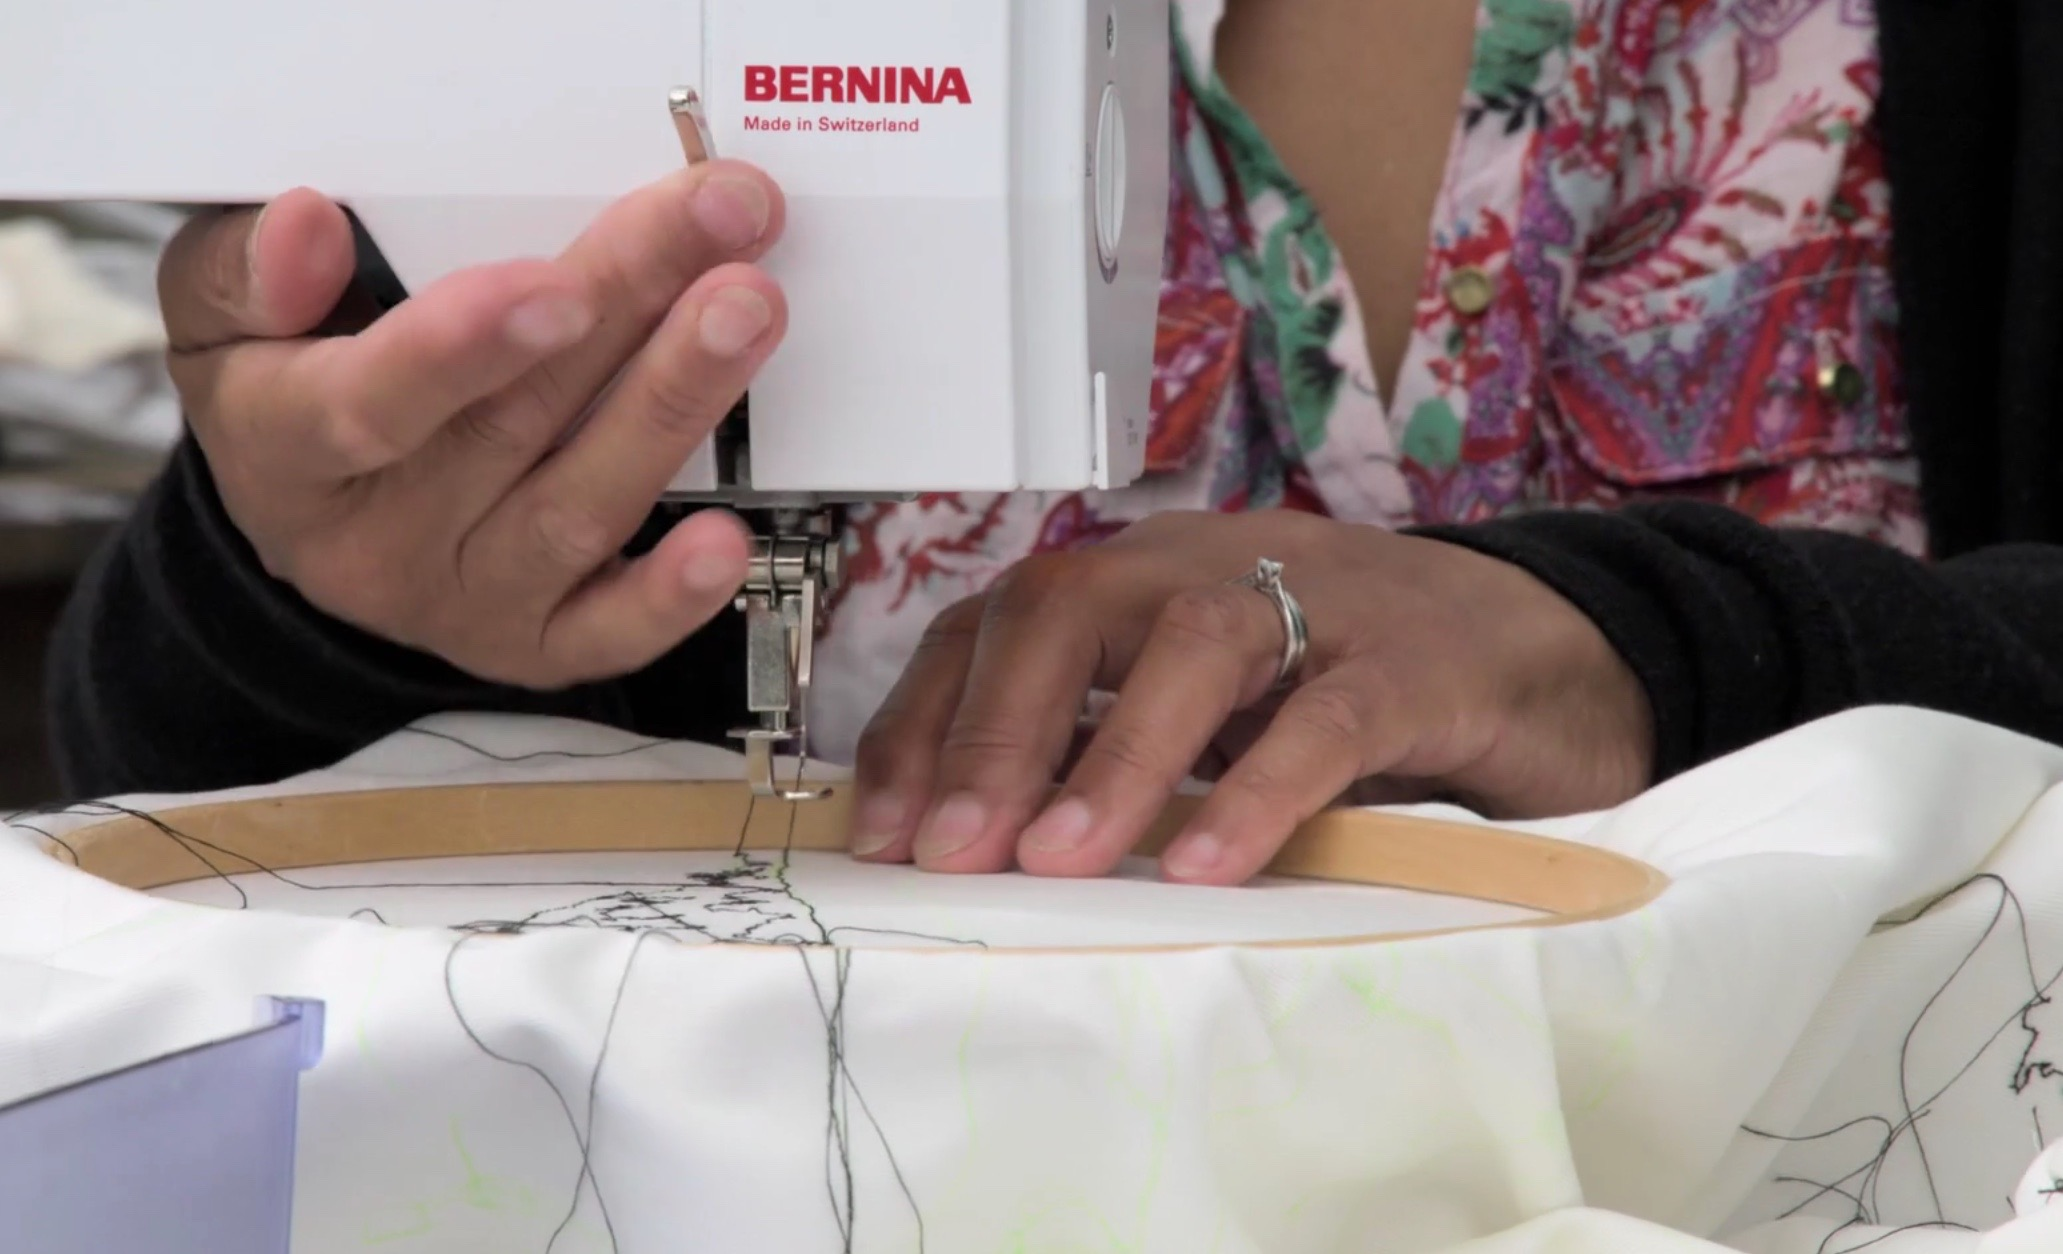 Freehand machine stitching the view